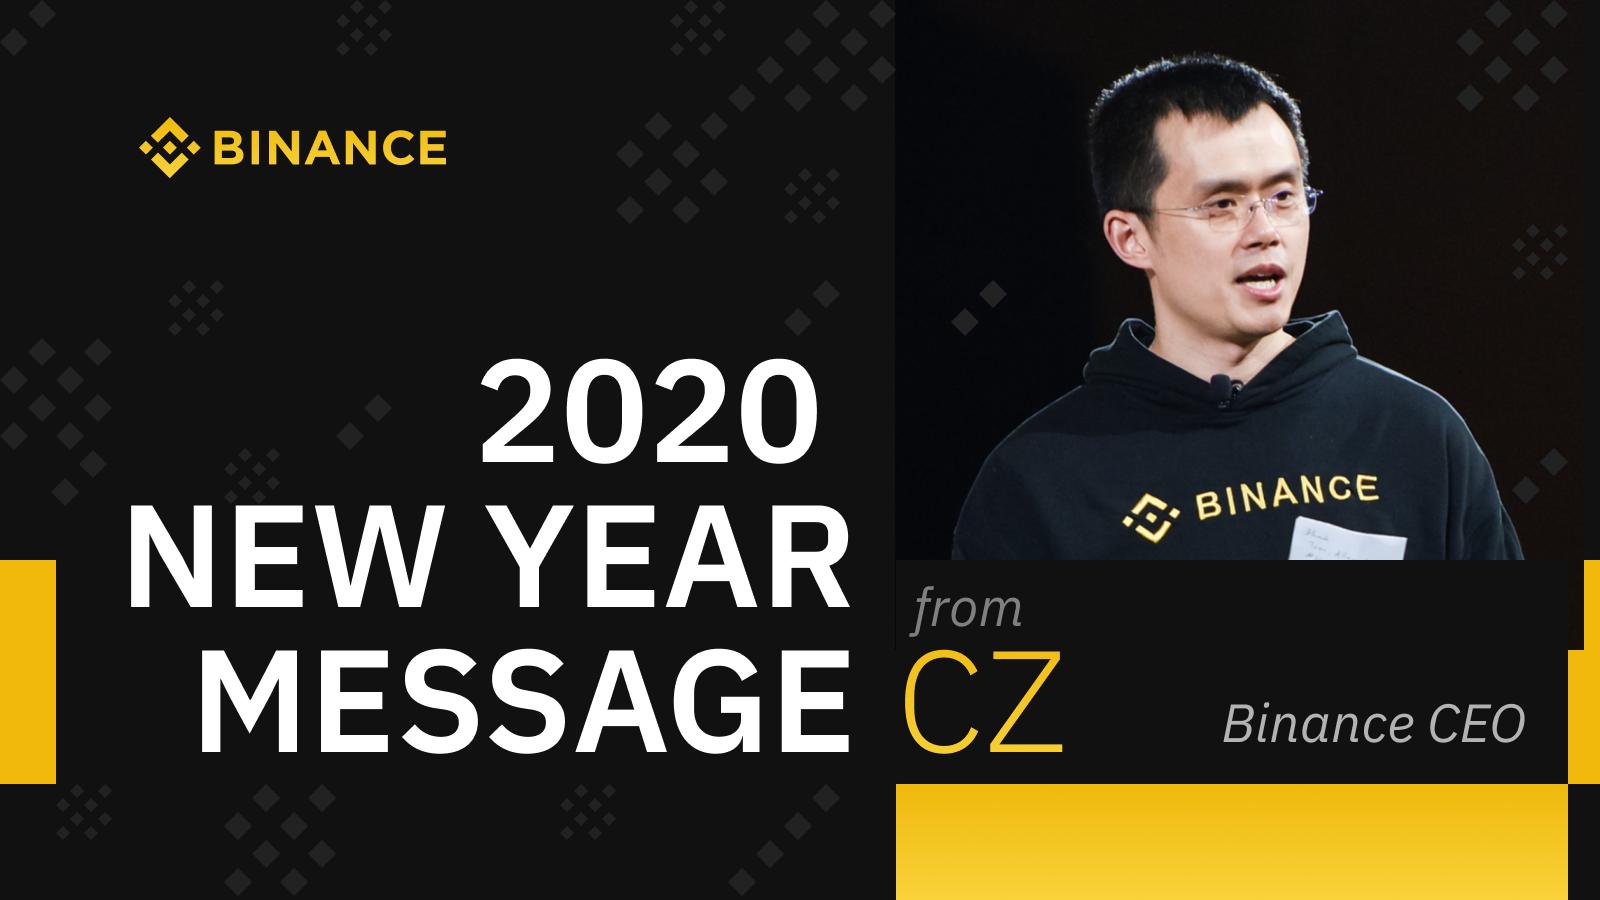 Binance 2020 New Year Message Building Foundations Binance Blog 1600x900